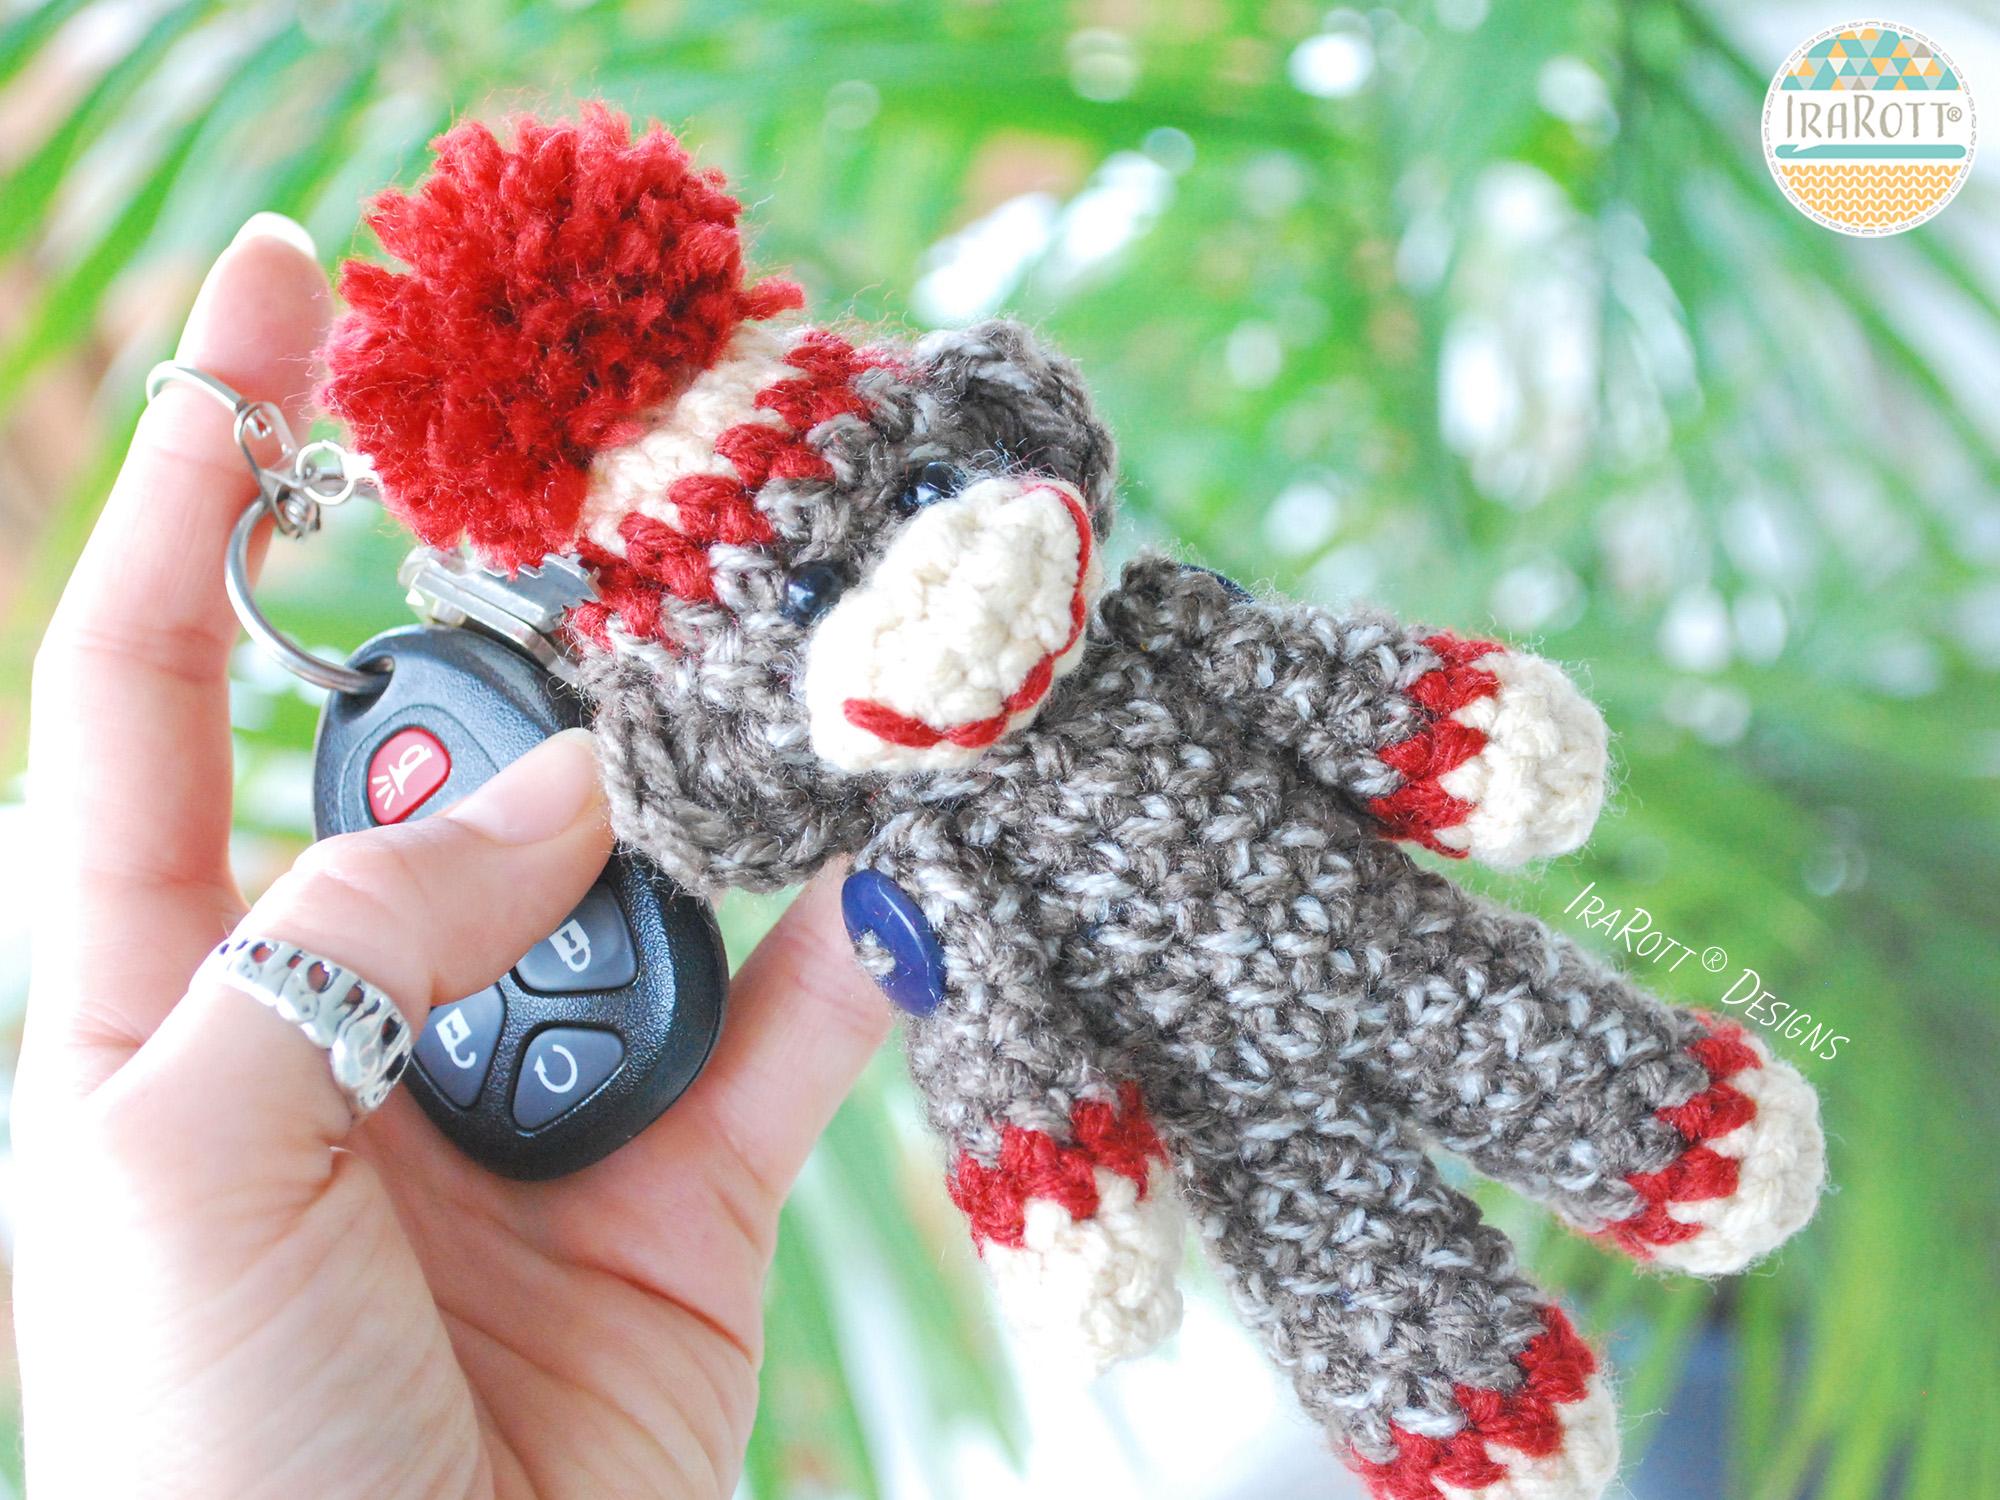 Amigurumi Crochet Sock Monkey : Ima lil Monkey Key Chain PDF Crochet Pattern - IraRott Inc.